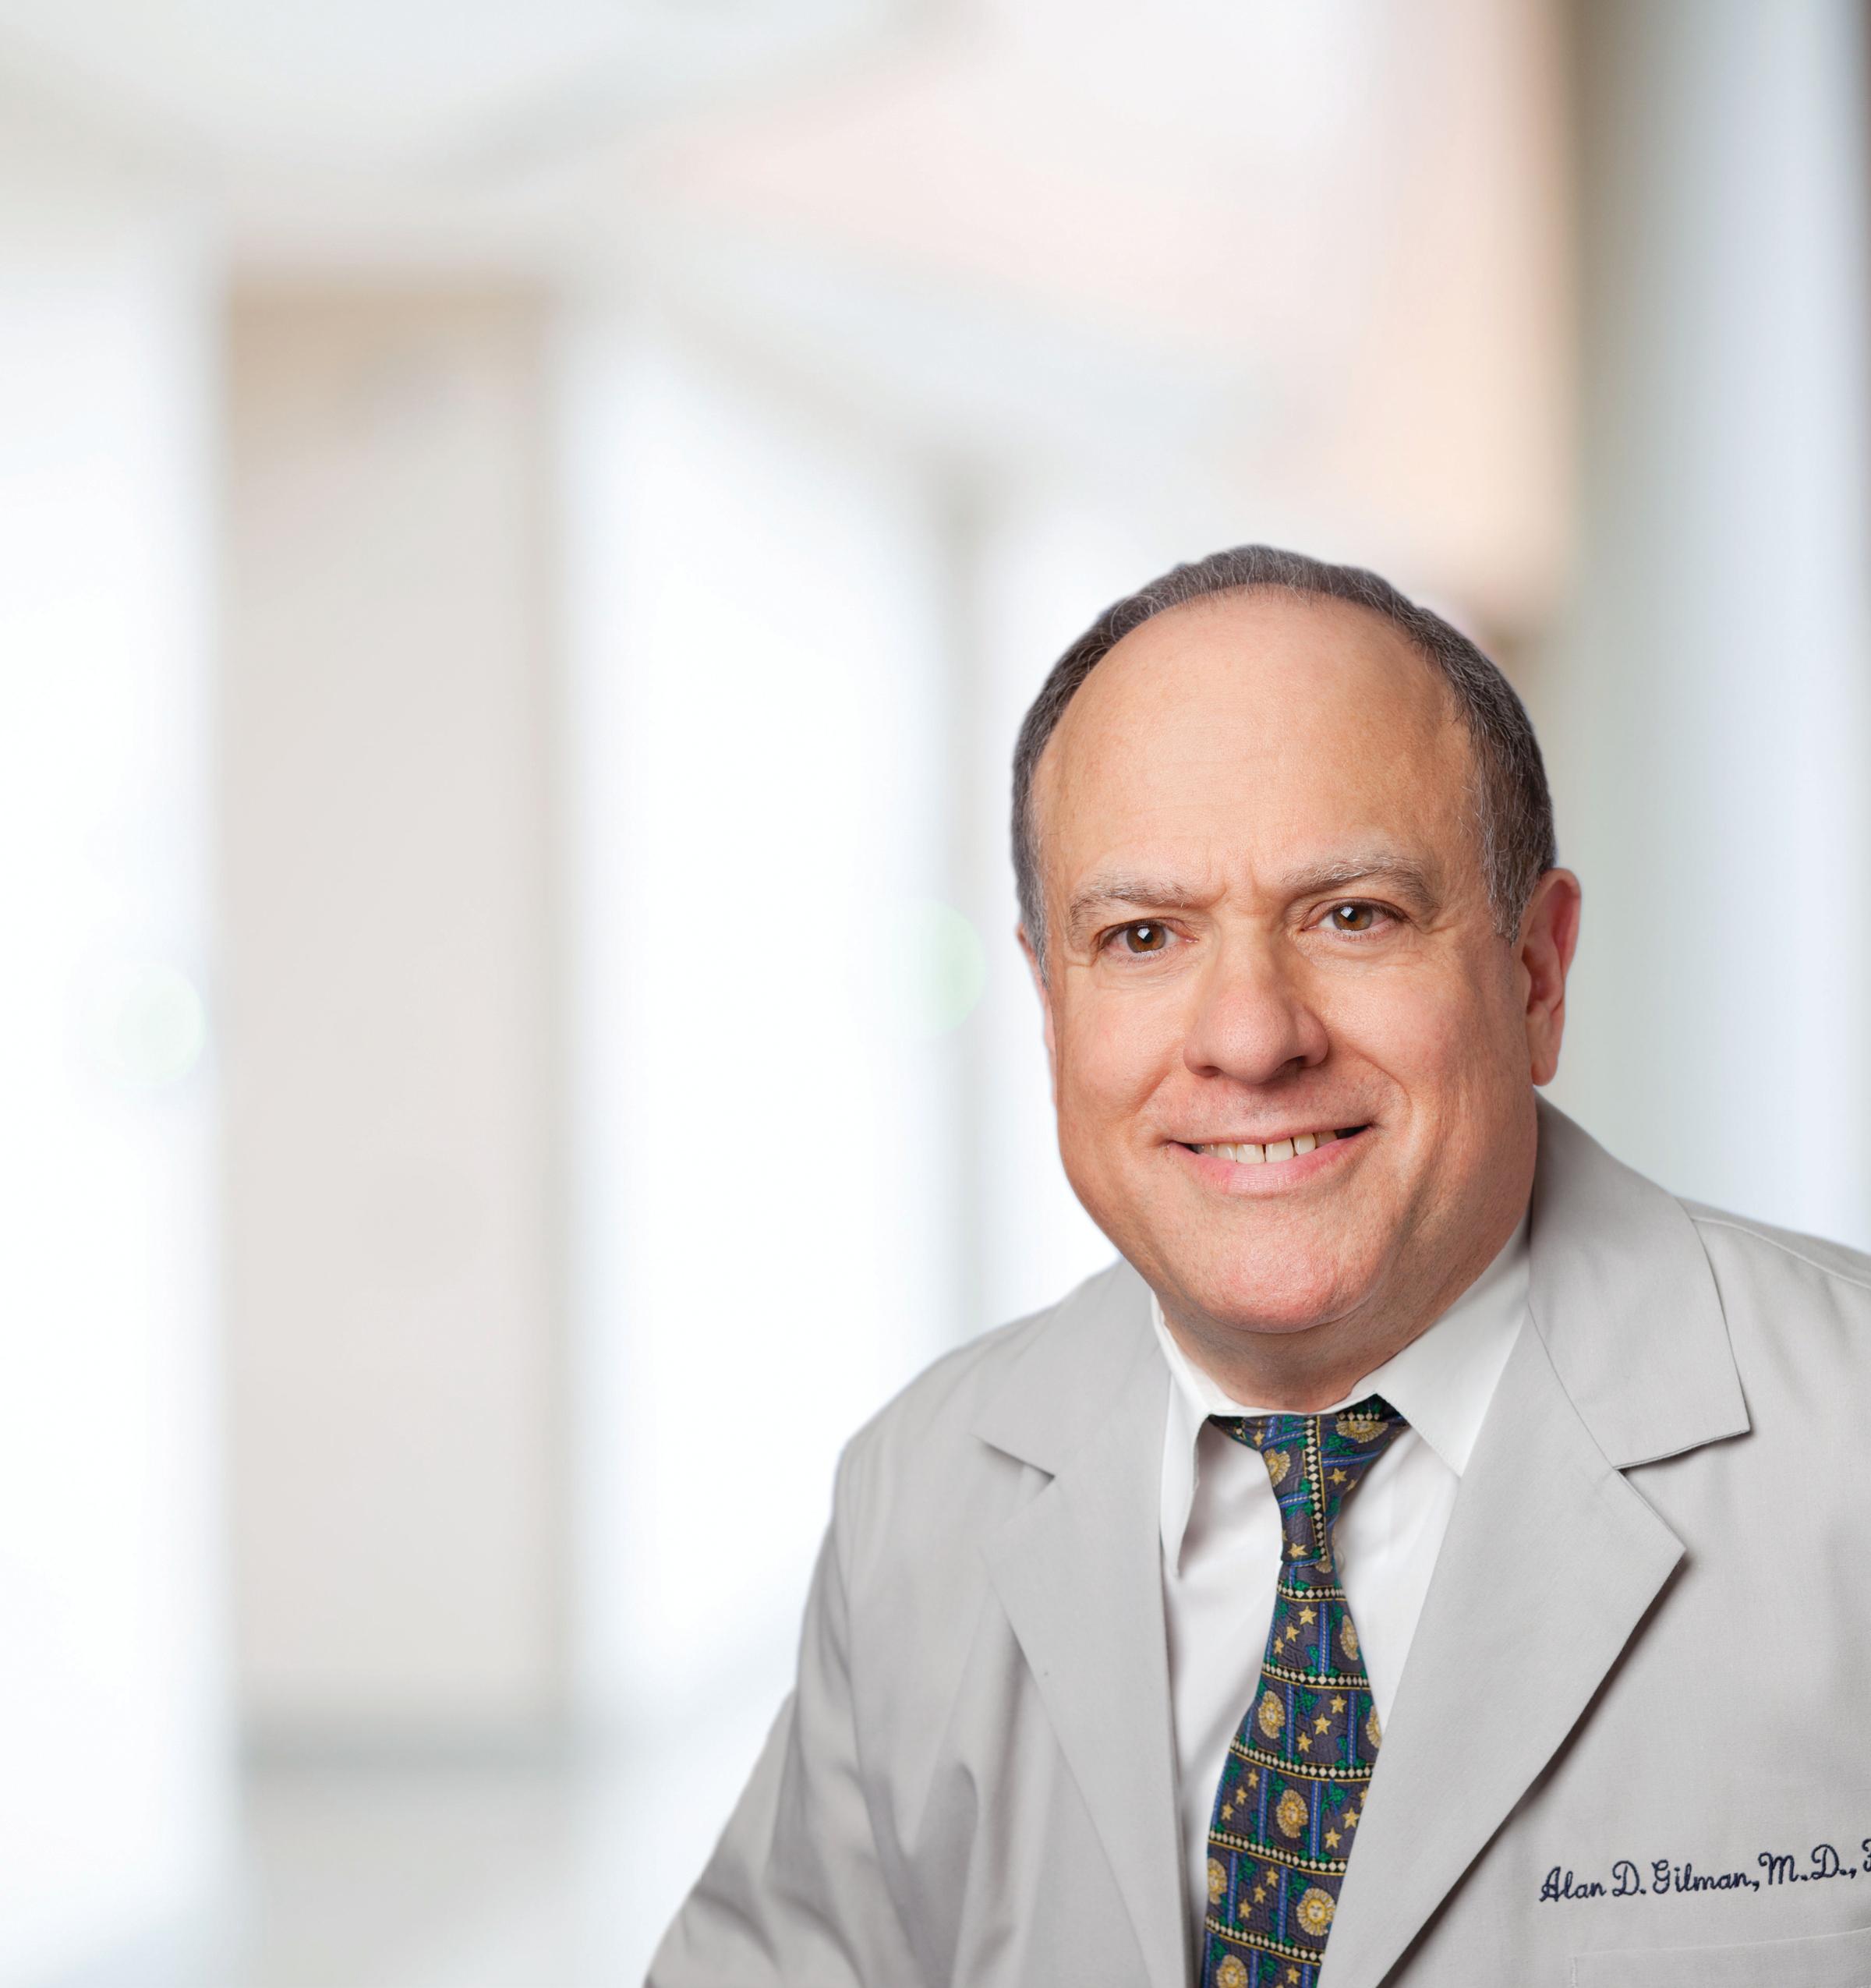 Dr. Alan Gilman MD - Chicago, IL